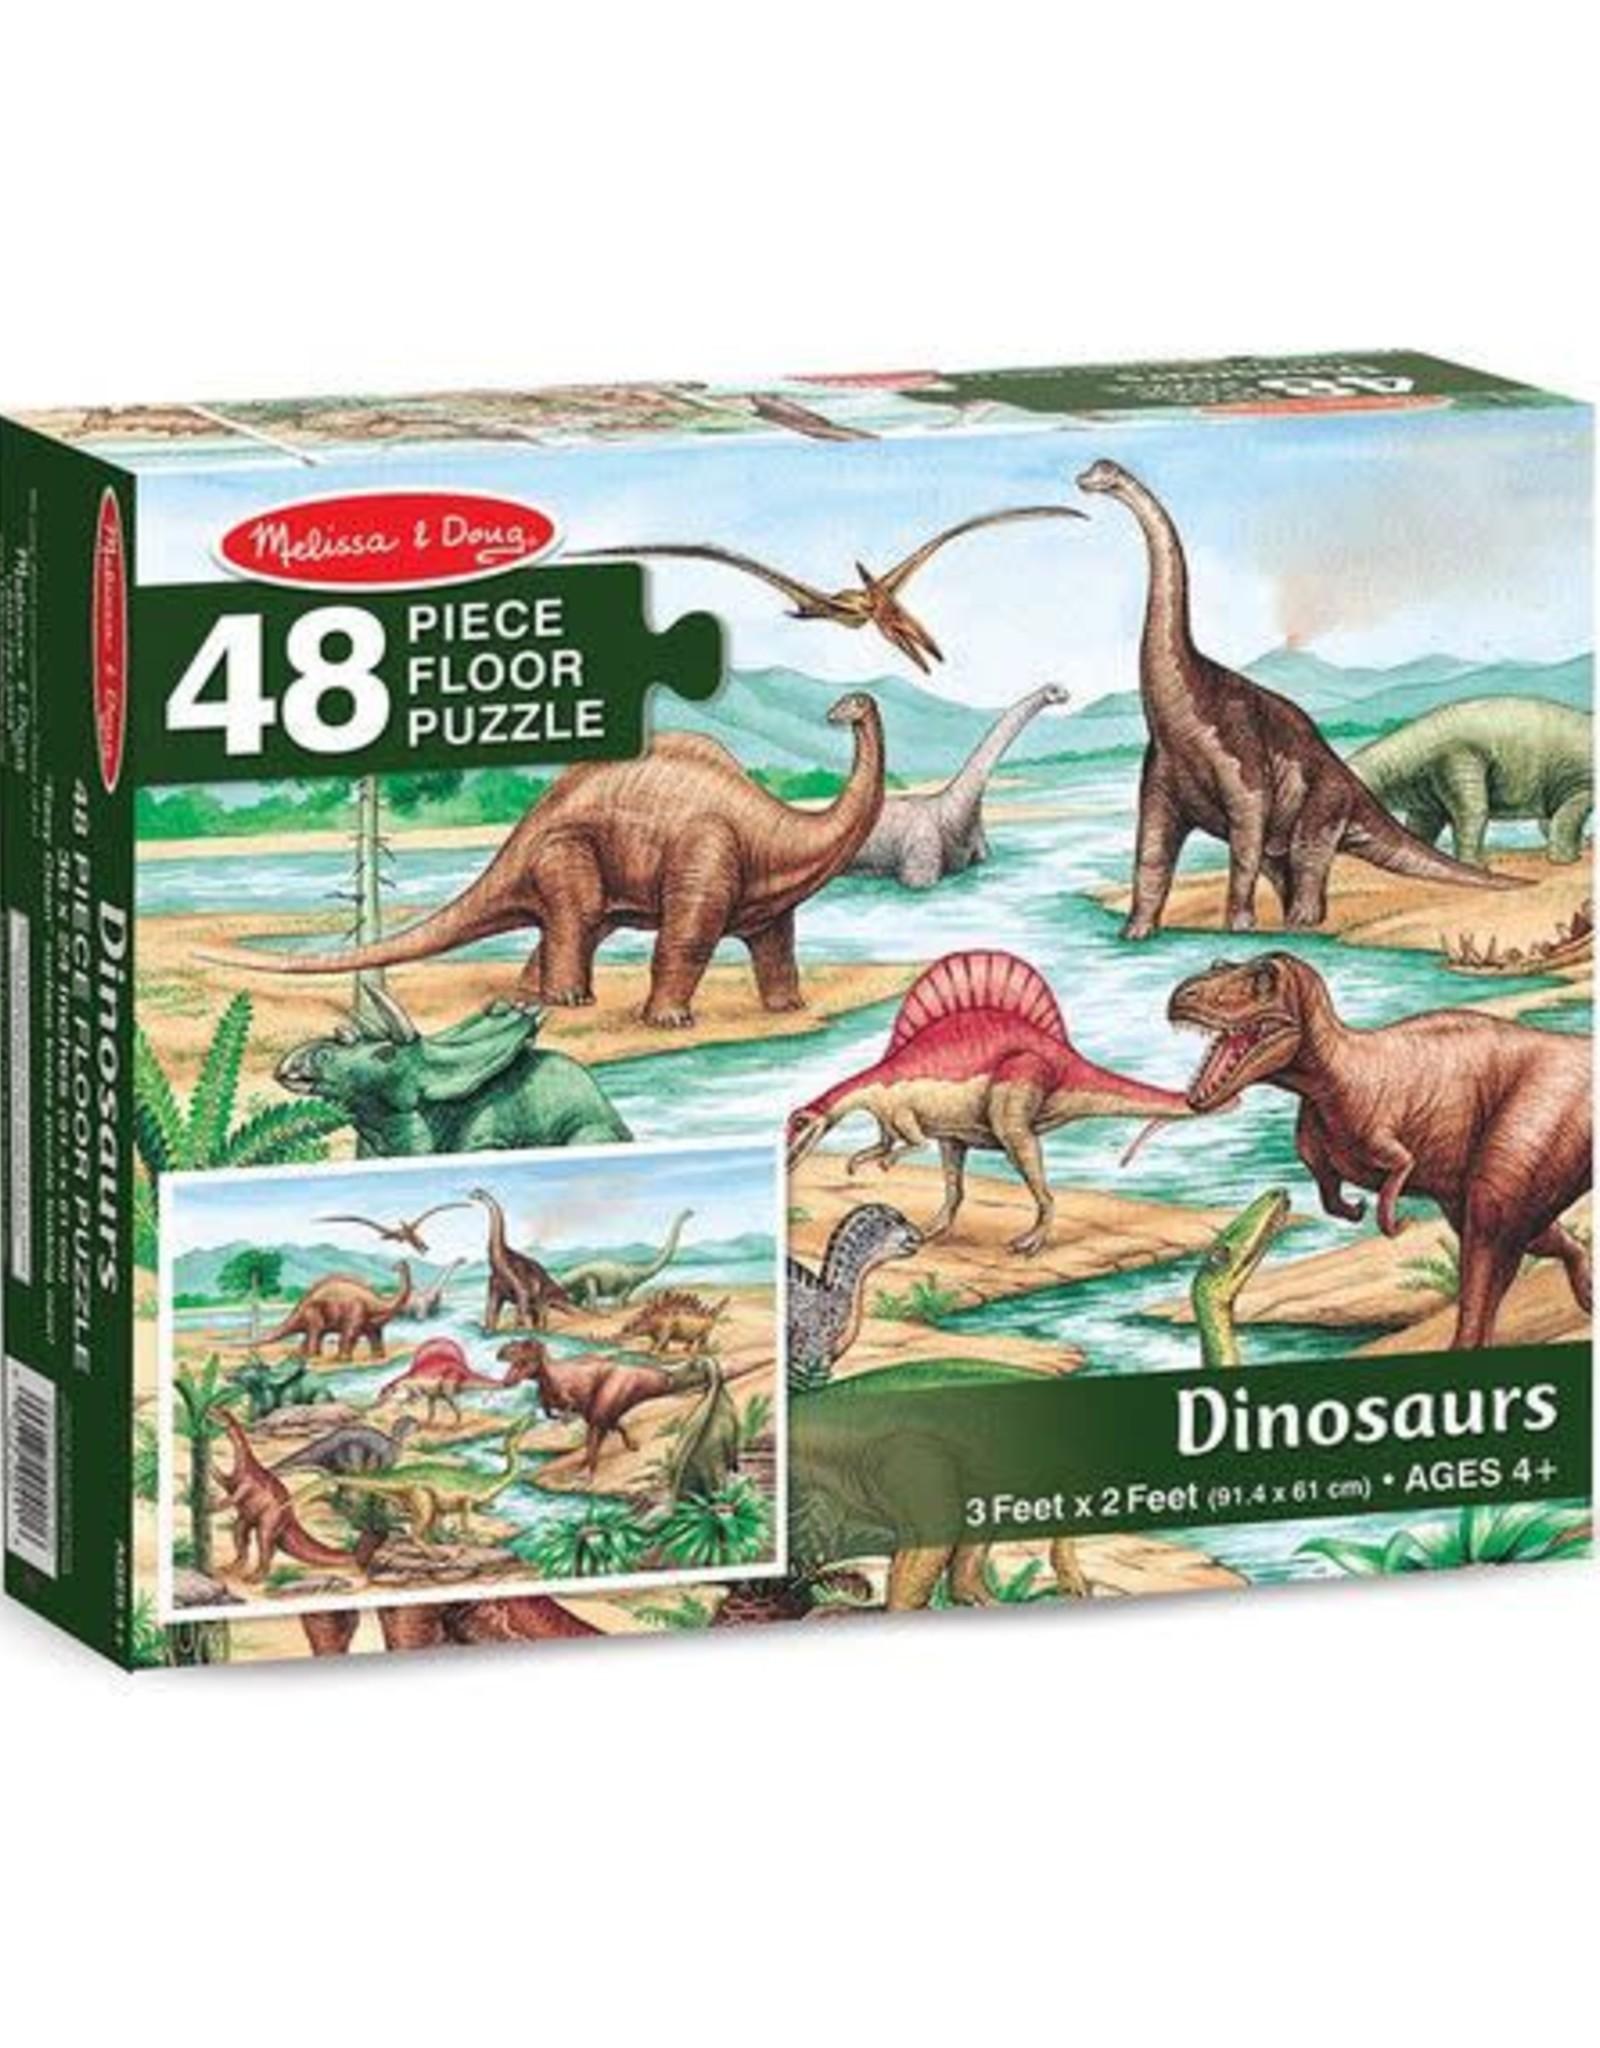 Melissa & Doug Dinosaurs 48pc Floor Puzzle